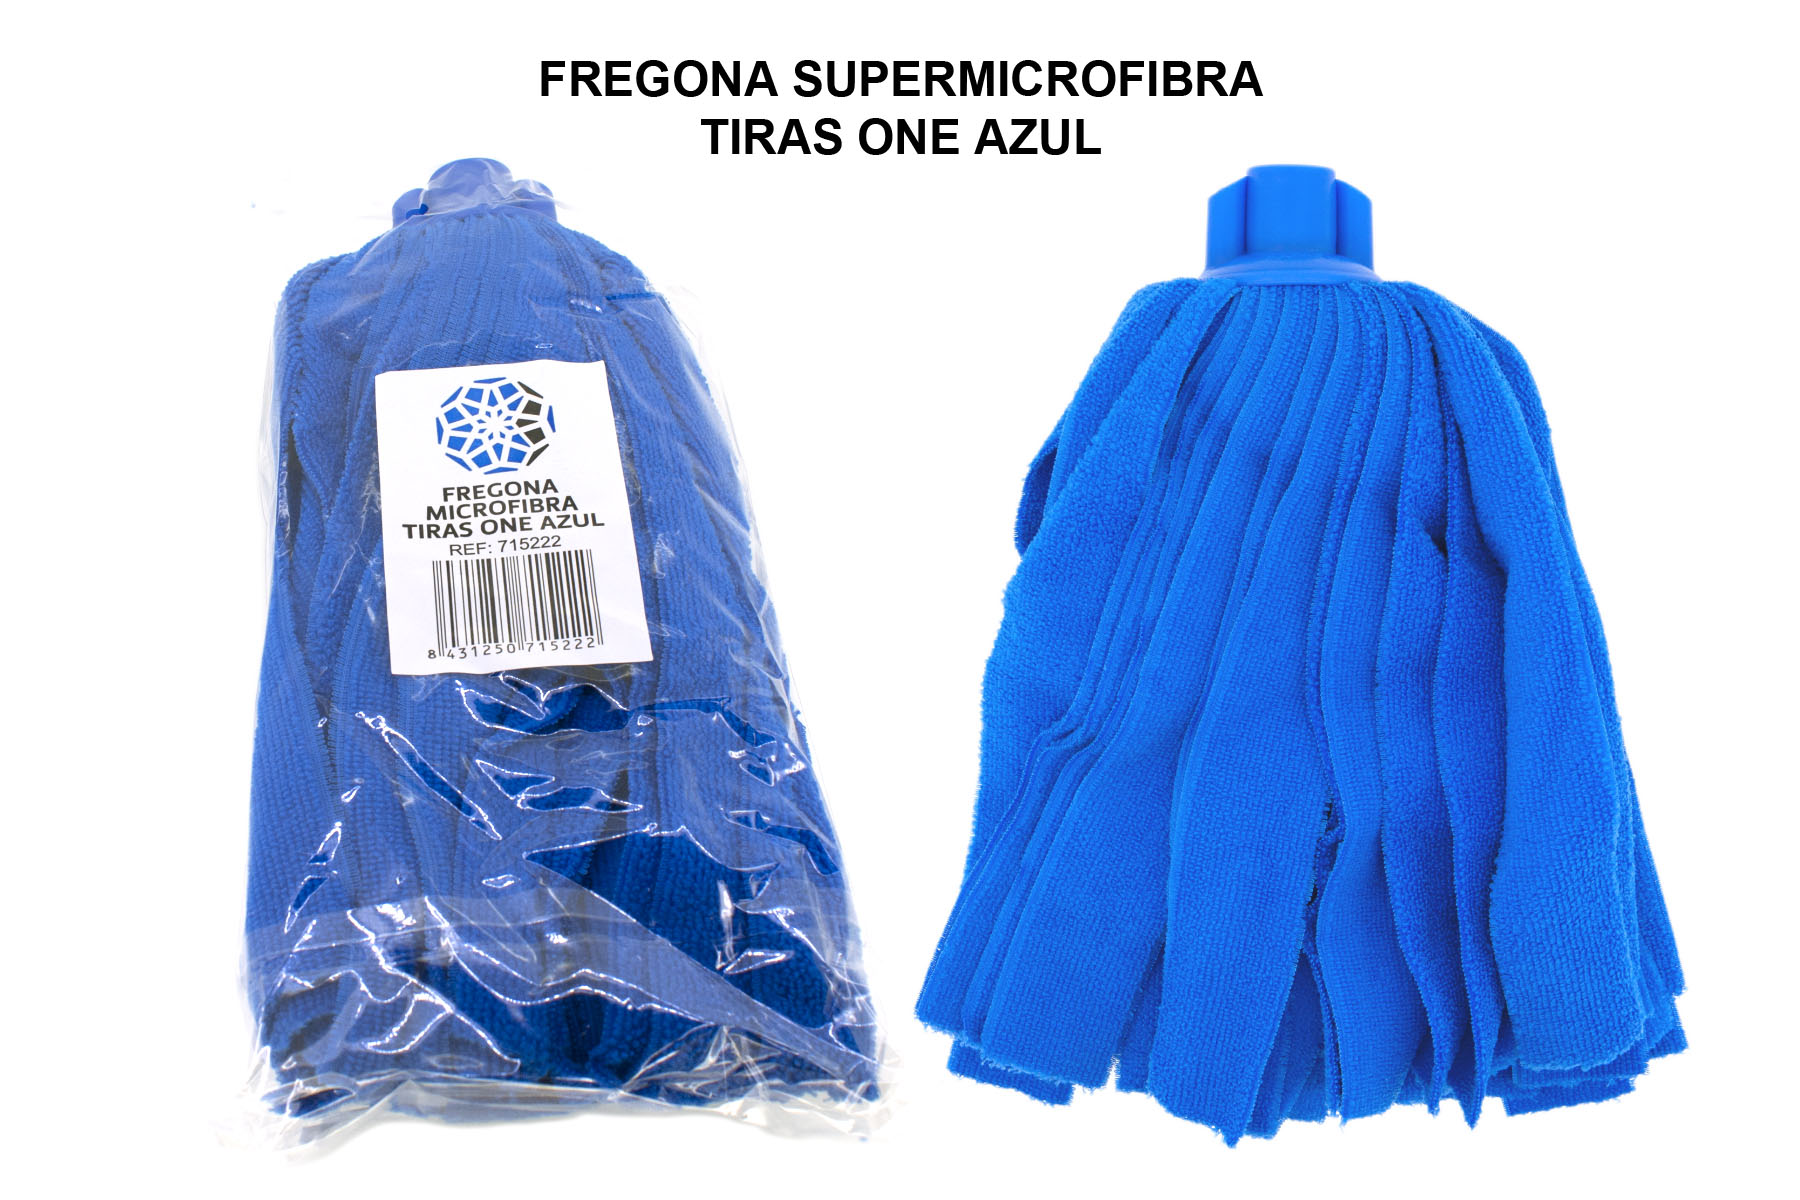 FREGONA SUPERMICROFIBRA TIRAS ONE AZUL